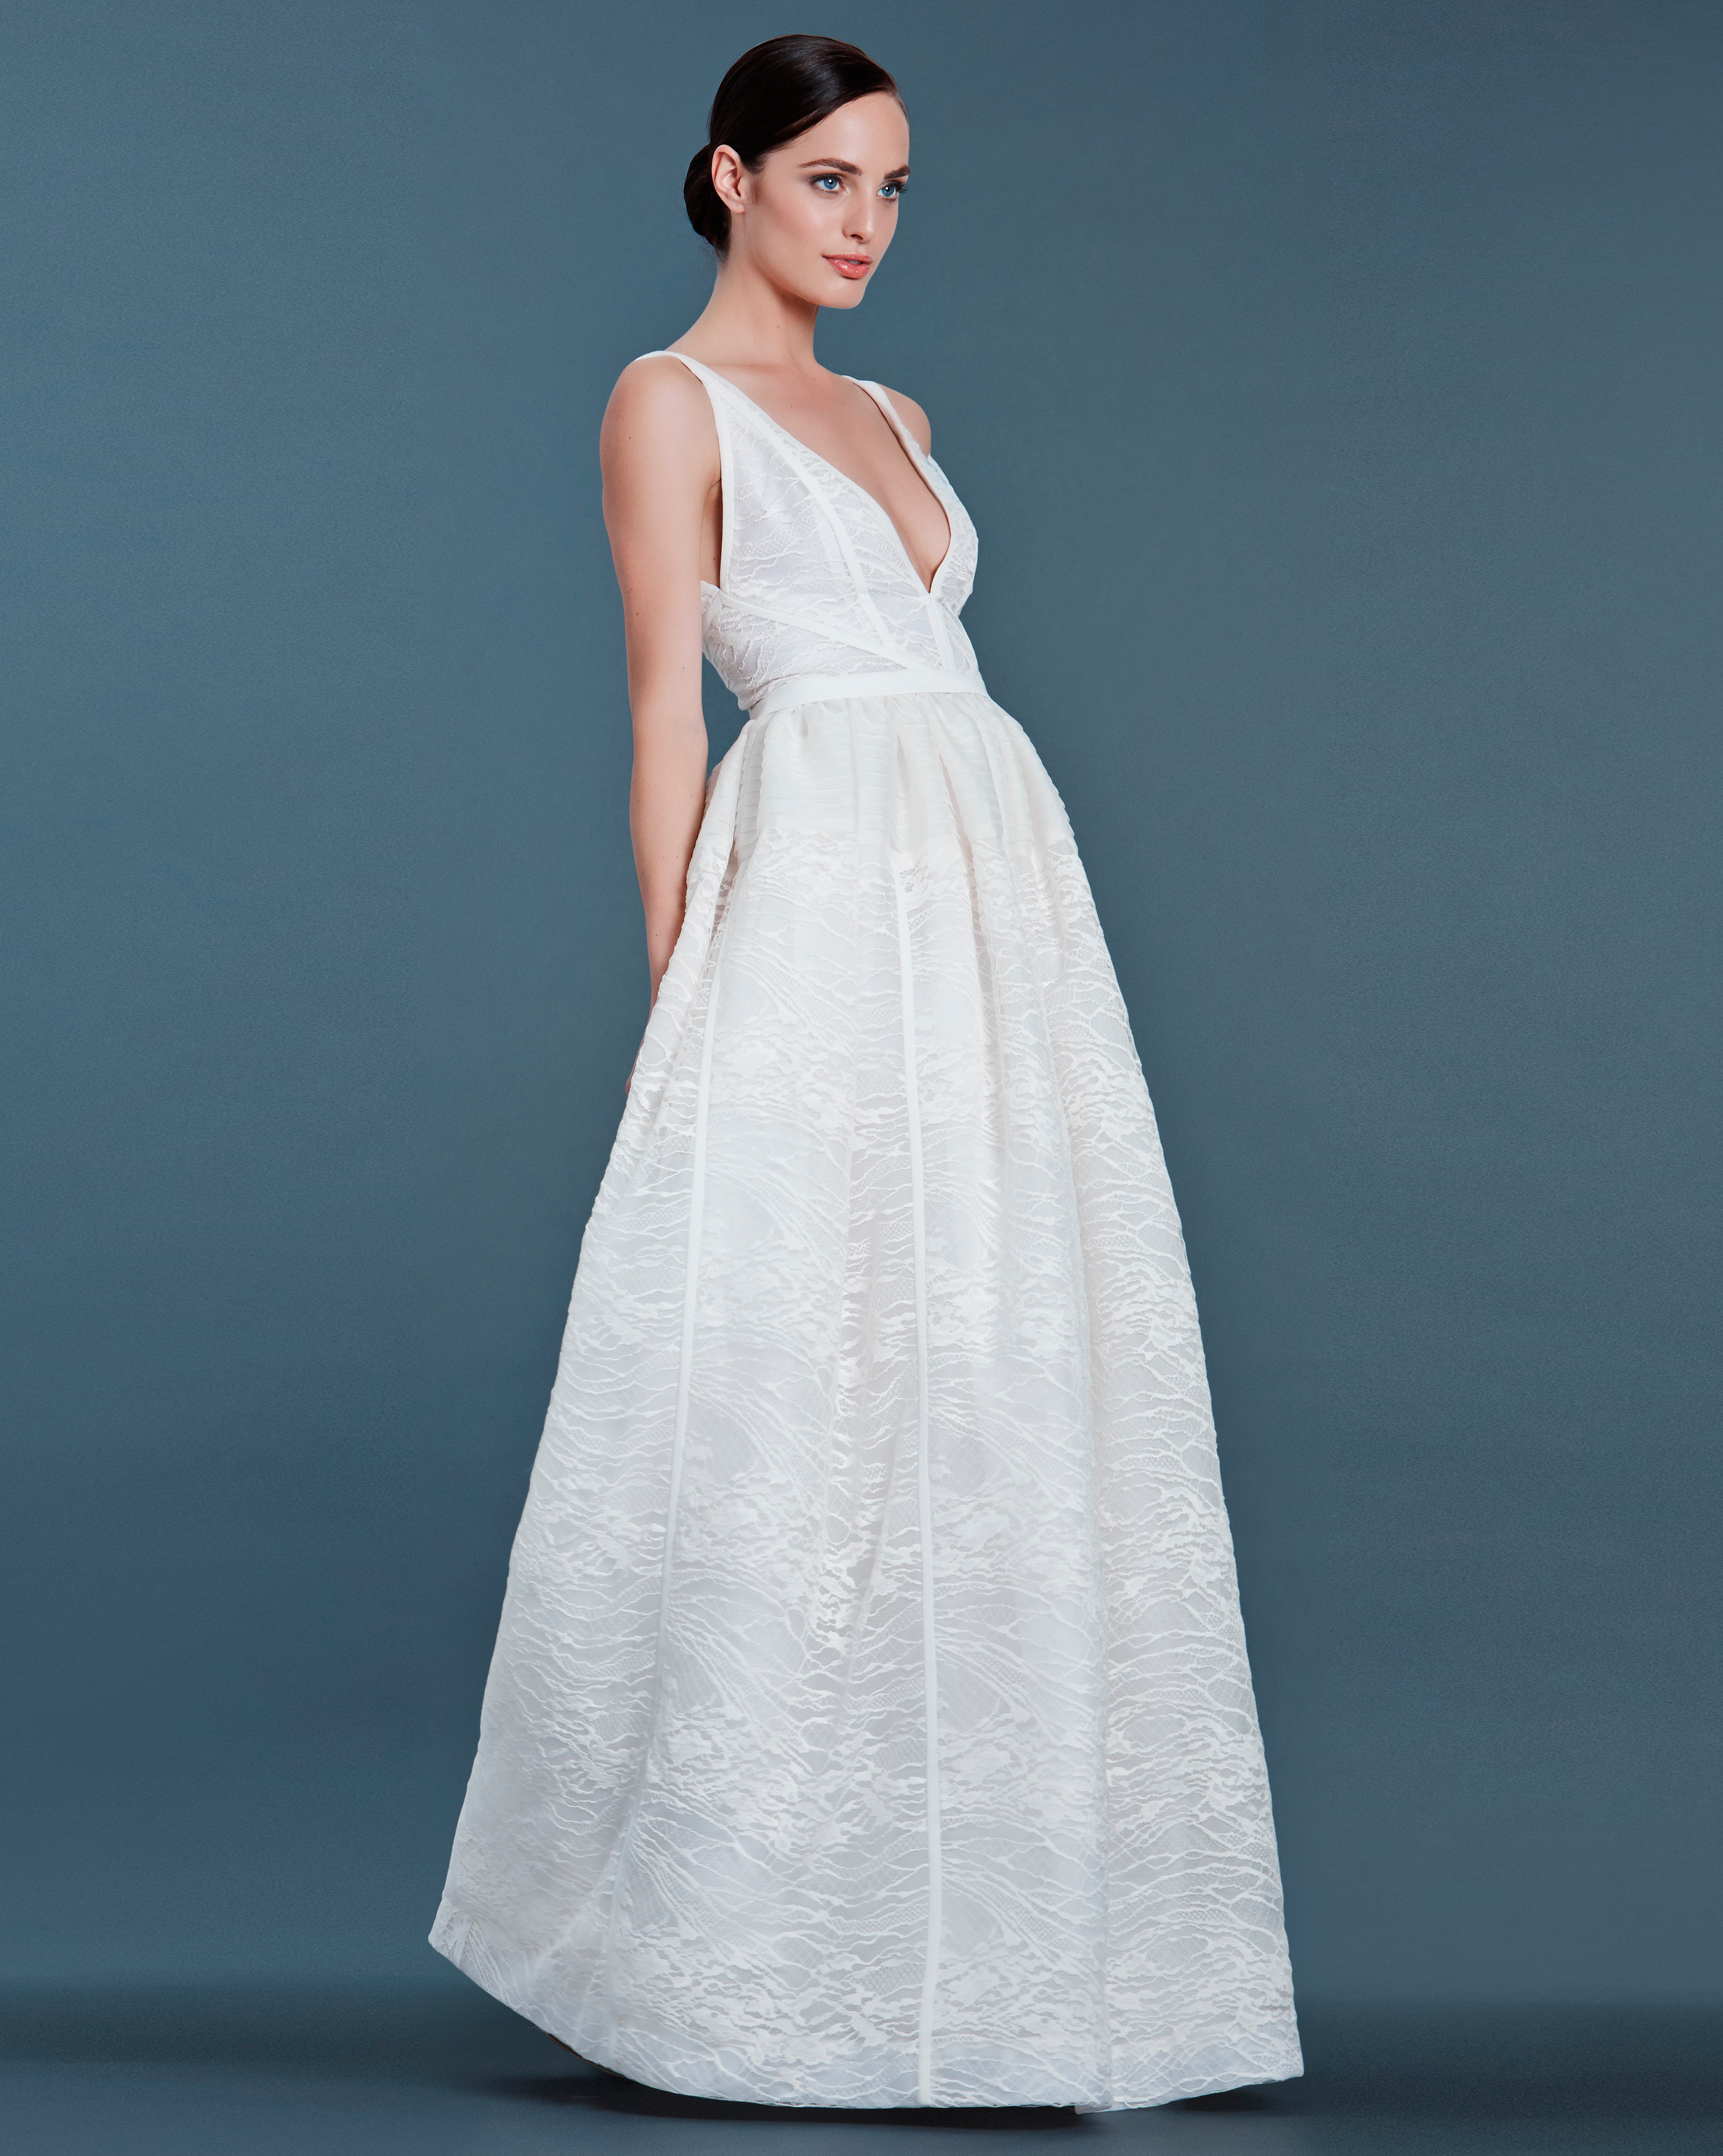 jmendel-fall2016-wedding-dress-6-fleur.jpg